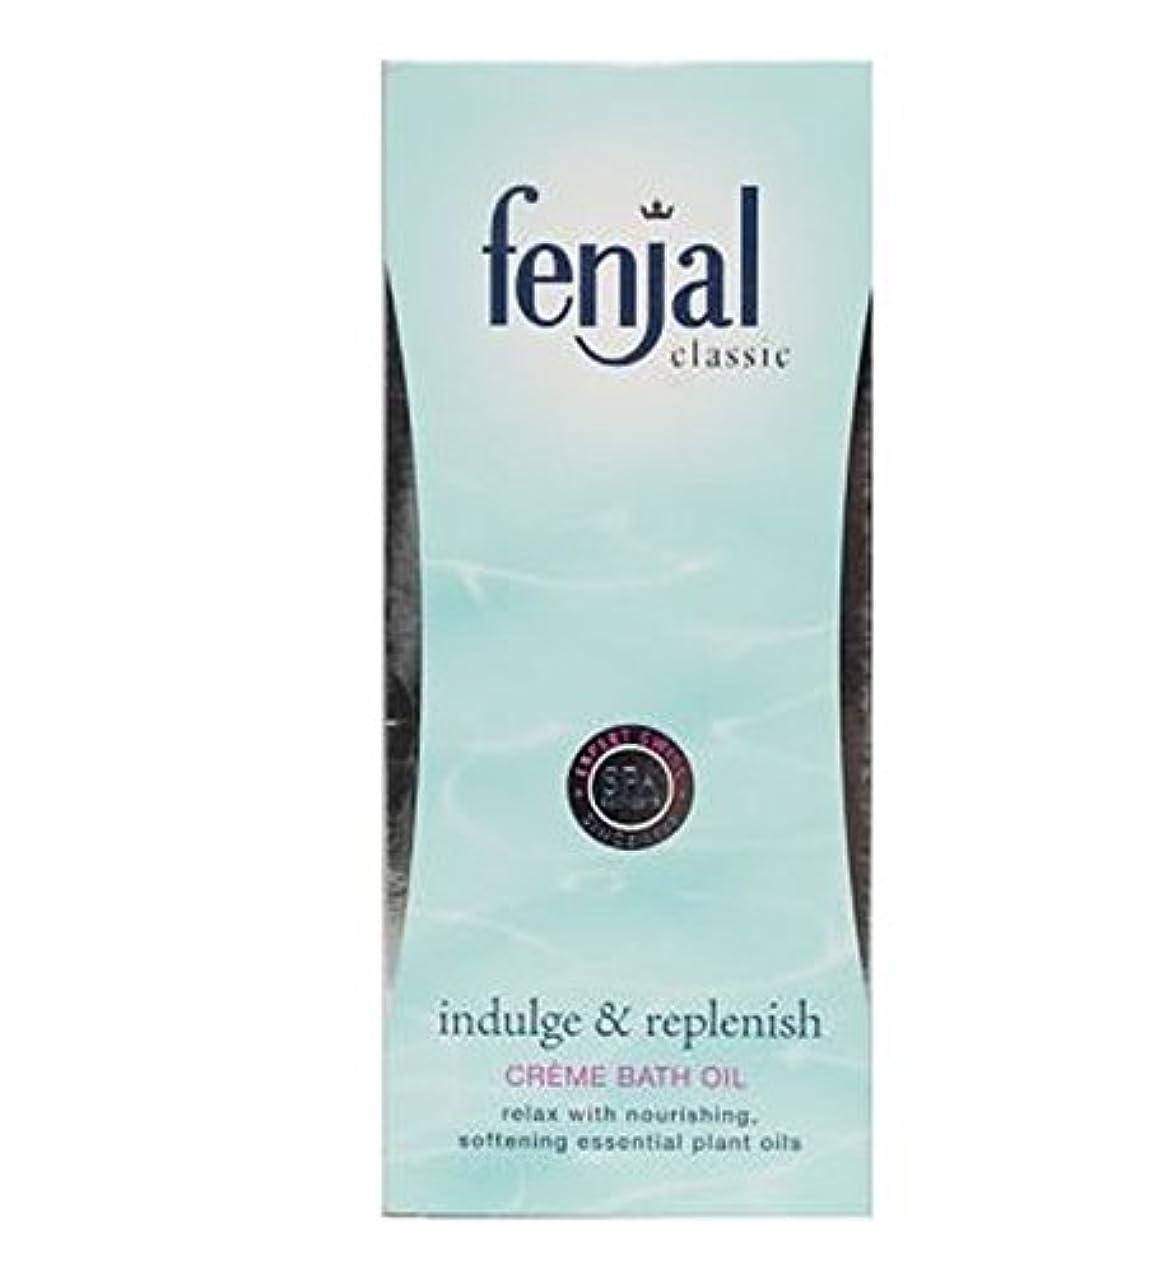 Fenjal古典的な高級クリームバスオイル125ミリリットル (Fenjal) (x2) - Fenjal Classic Luxury Creme Bath Oil 125 ml (Pack of 2) [並行輸入品]